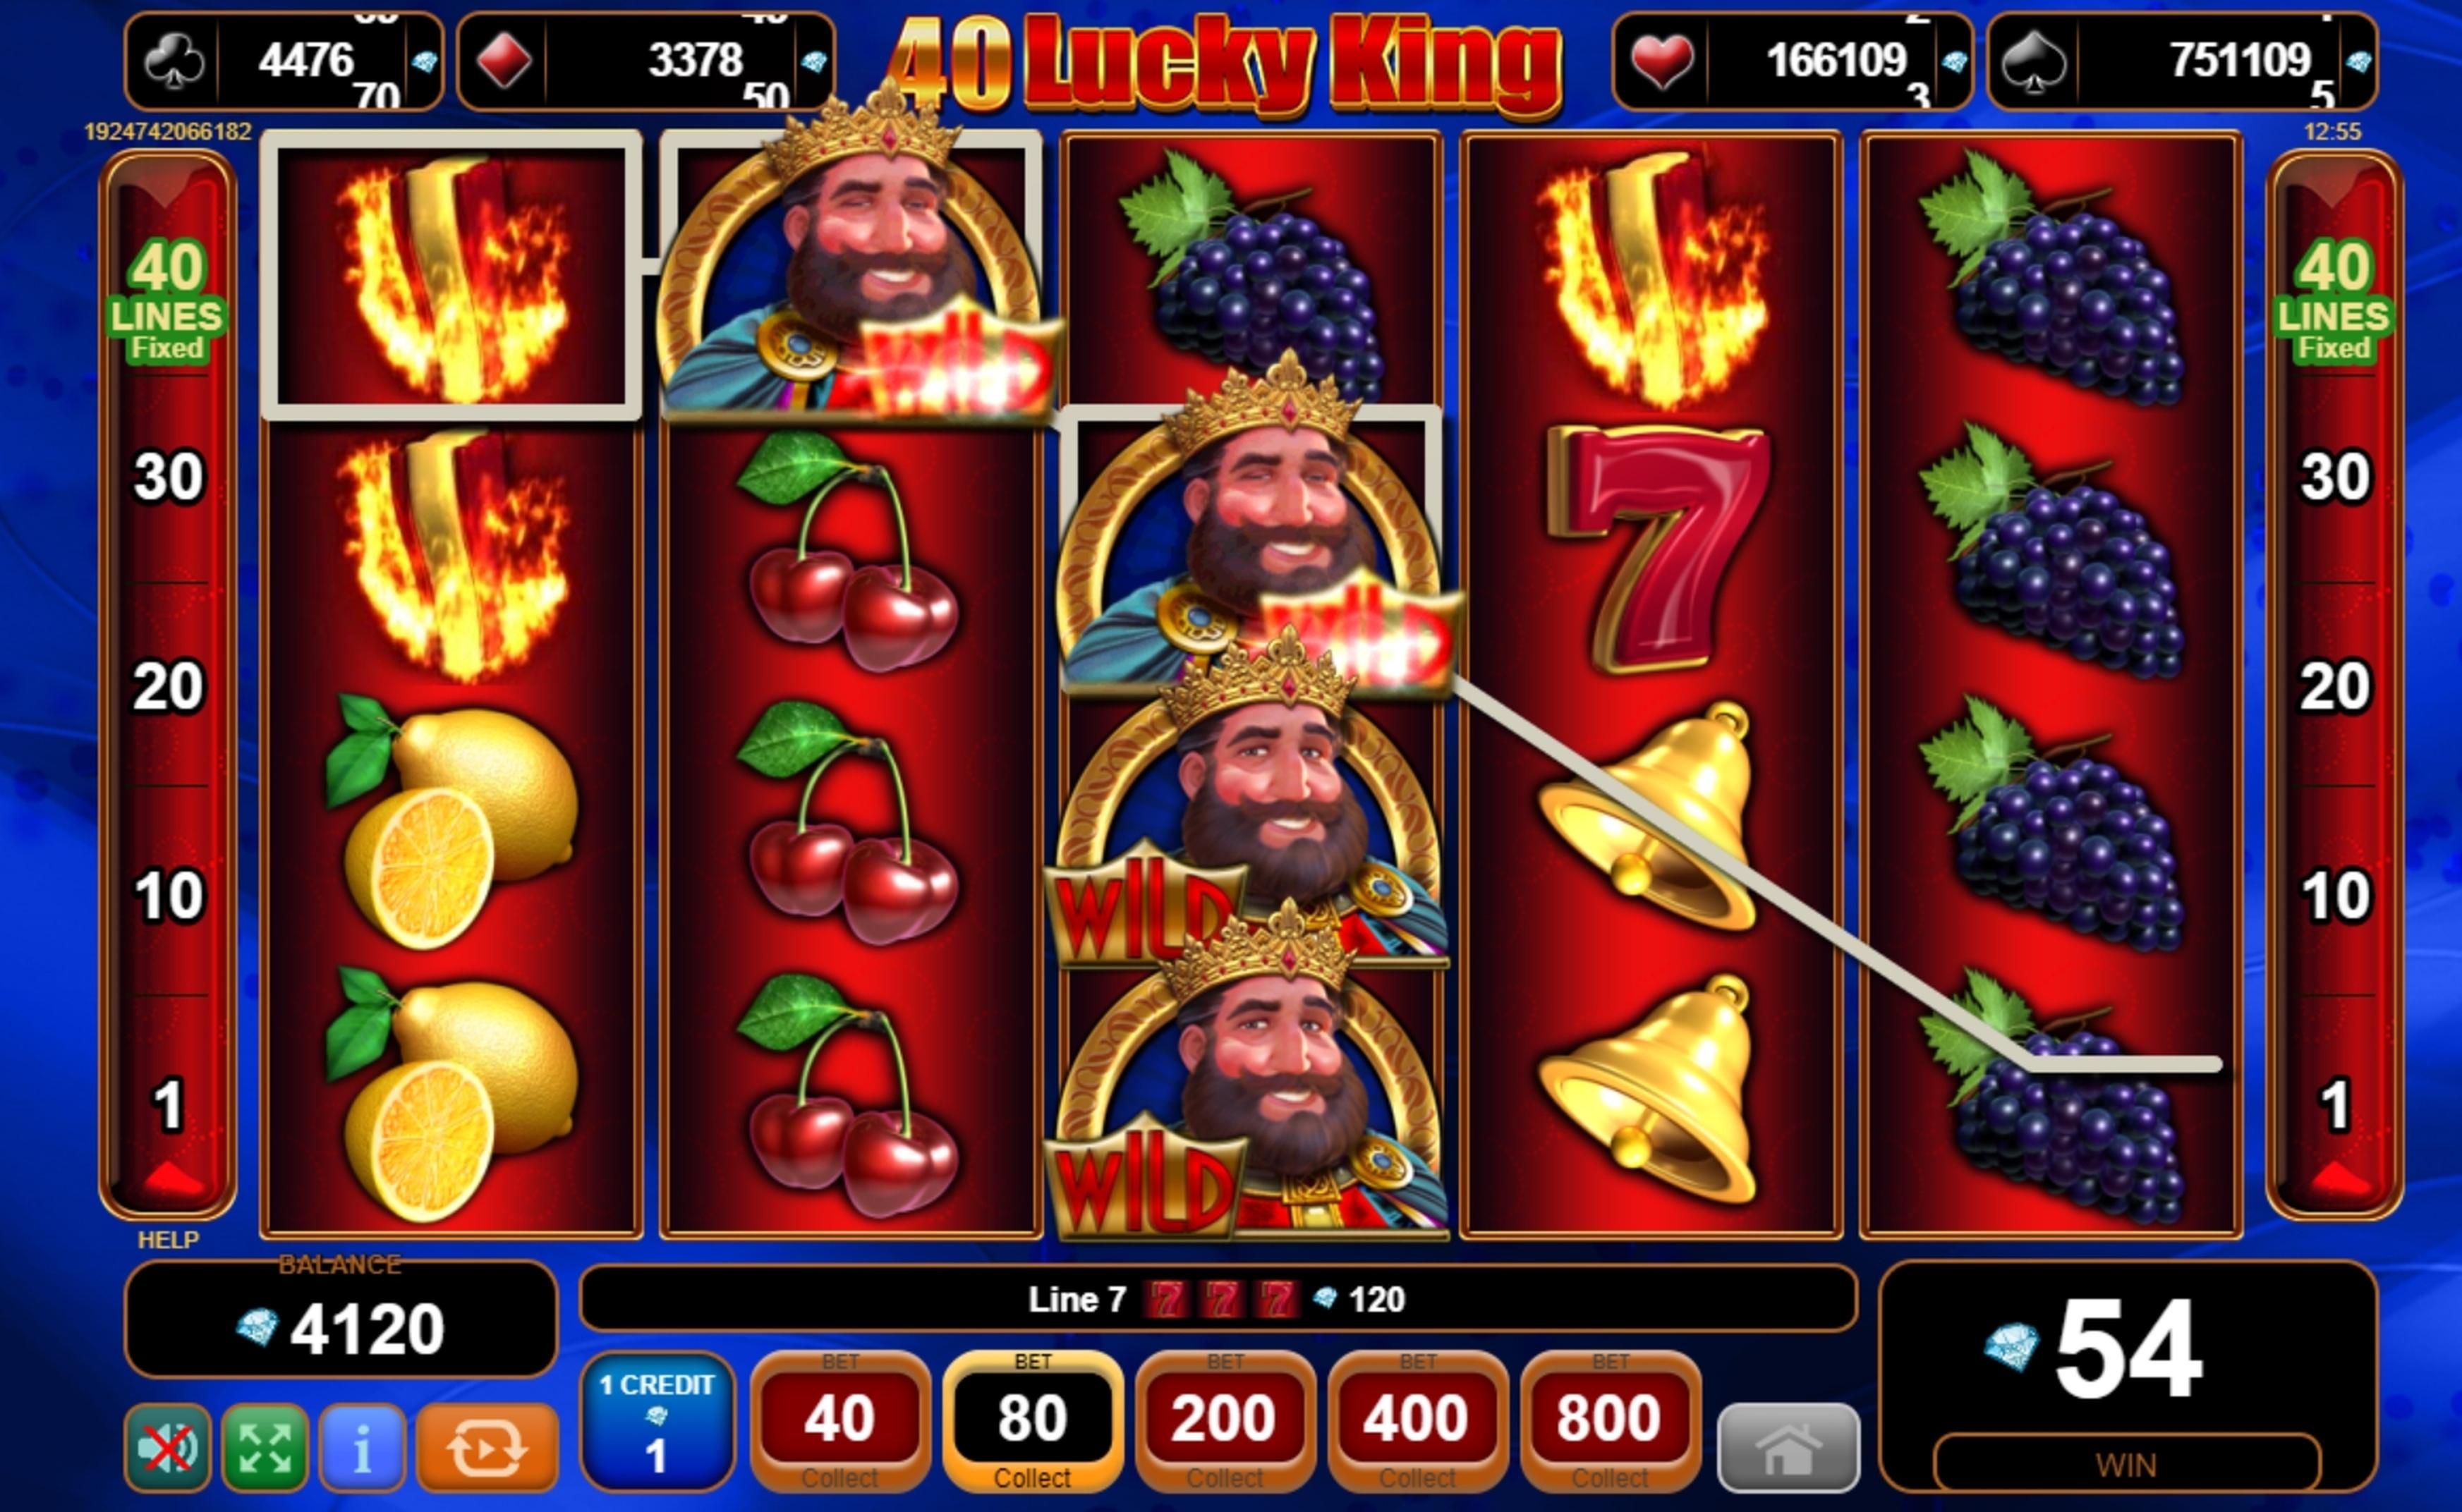 40 Lucky King Slot Machine